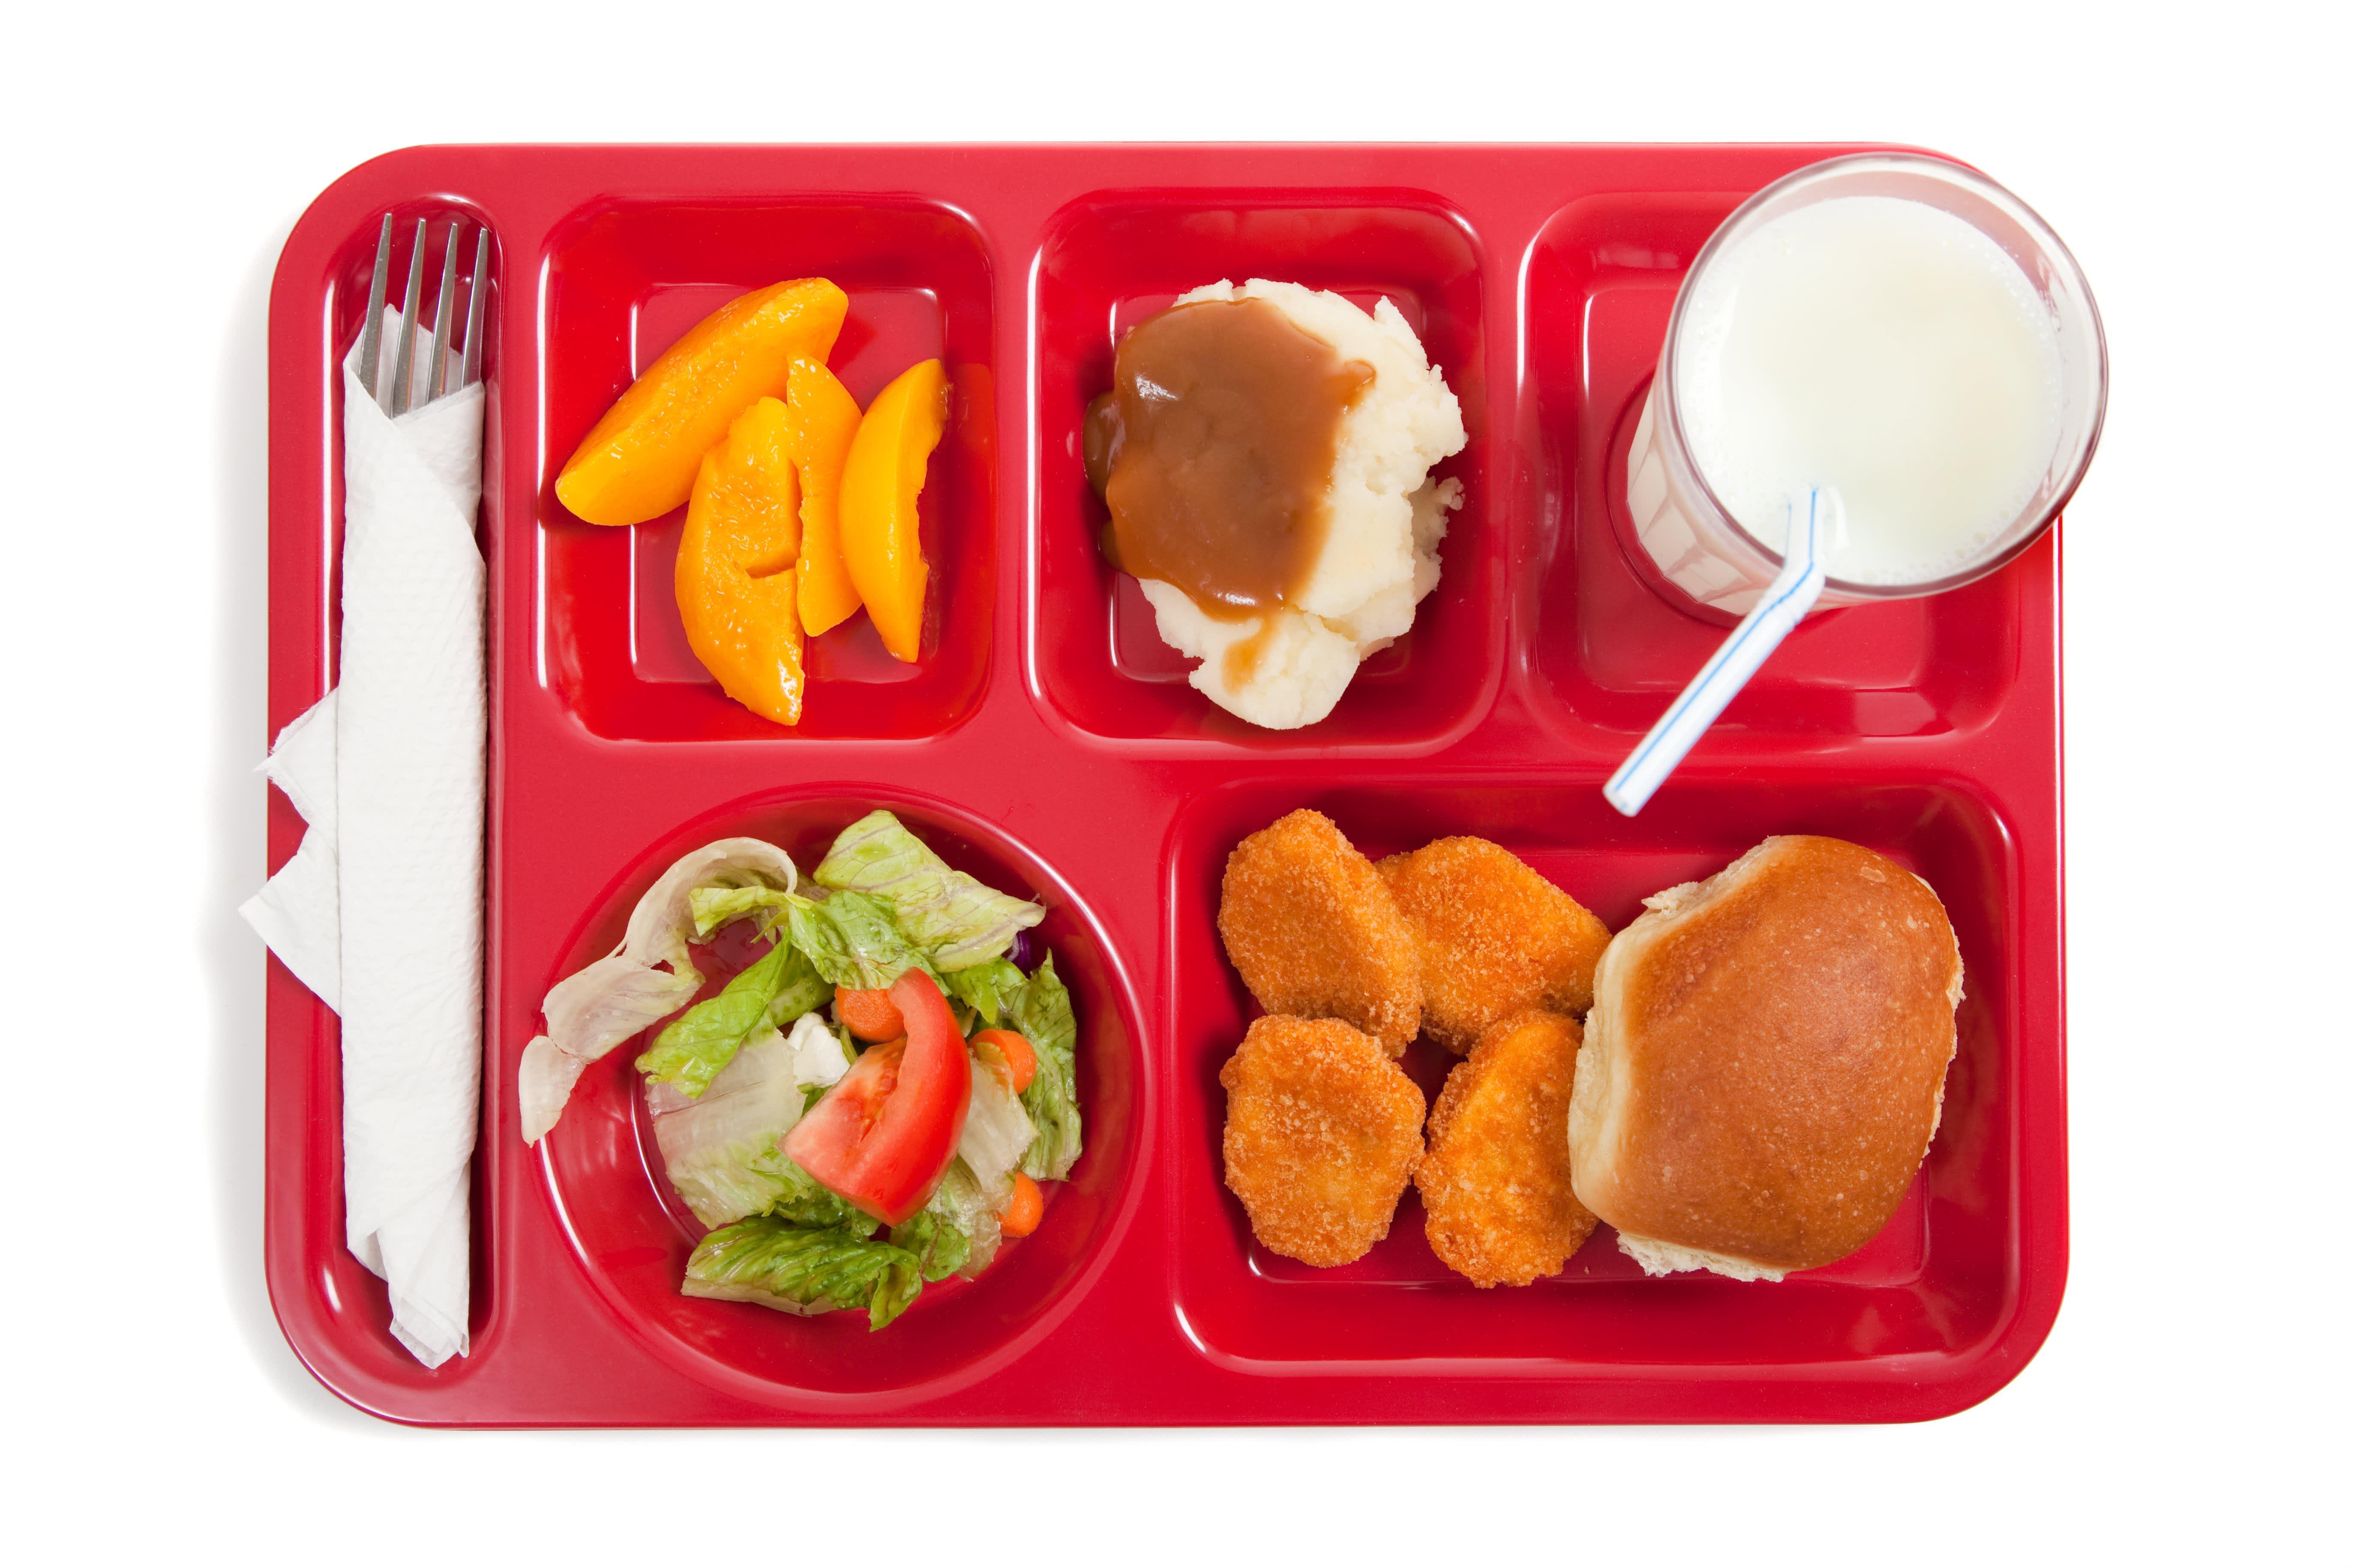 School lunch on a tray.